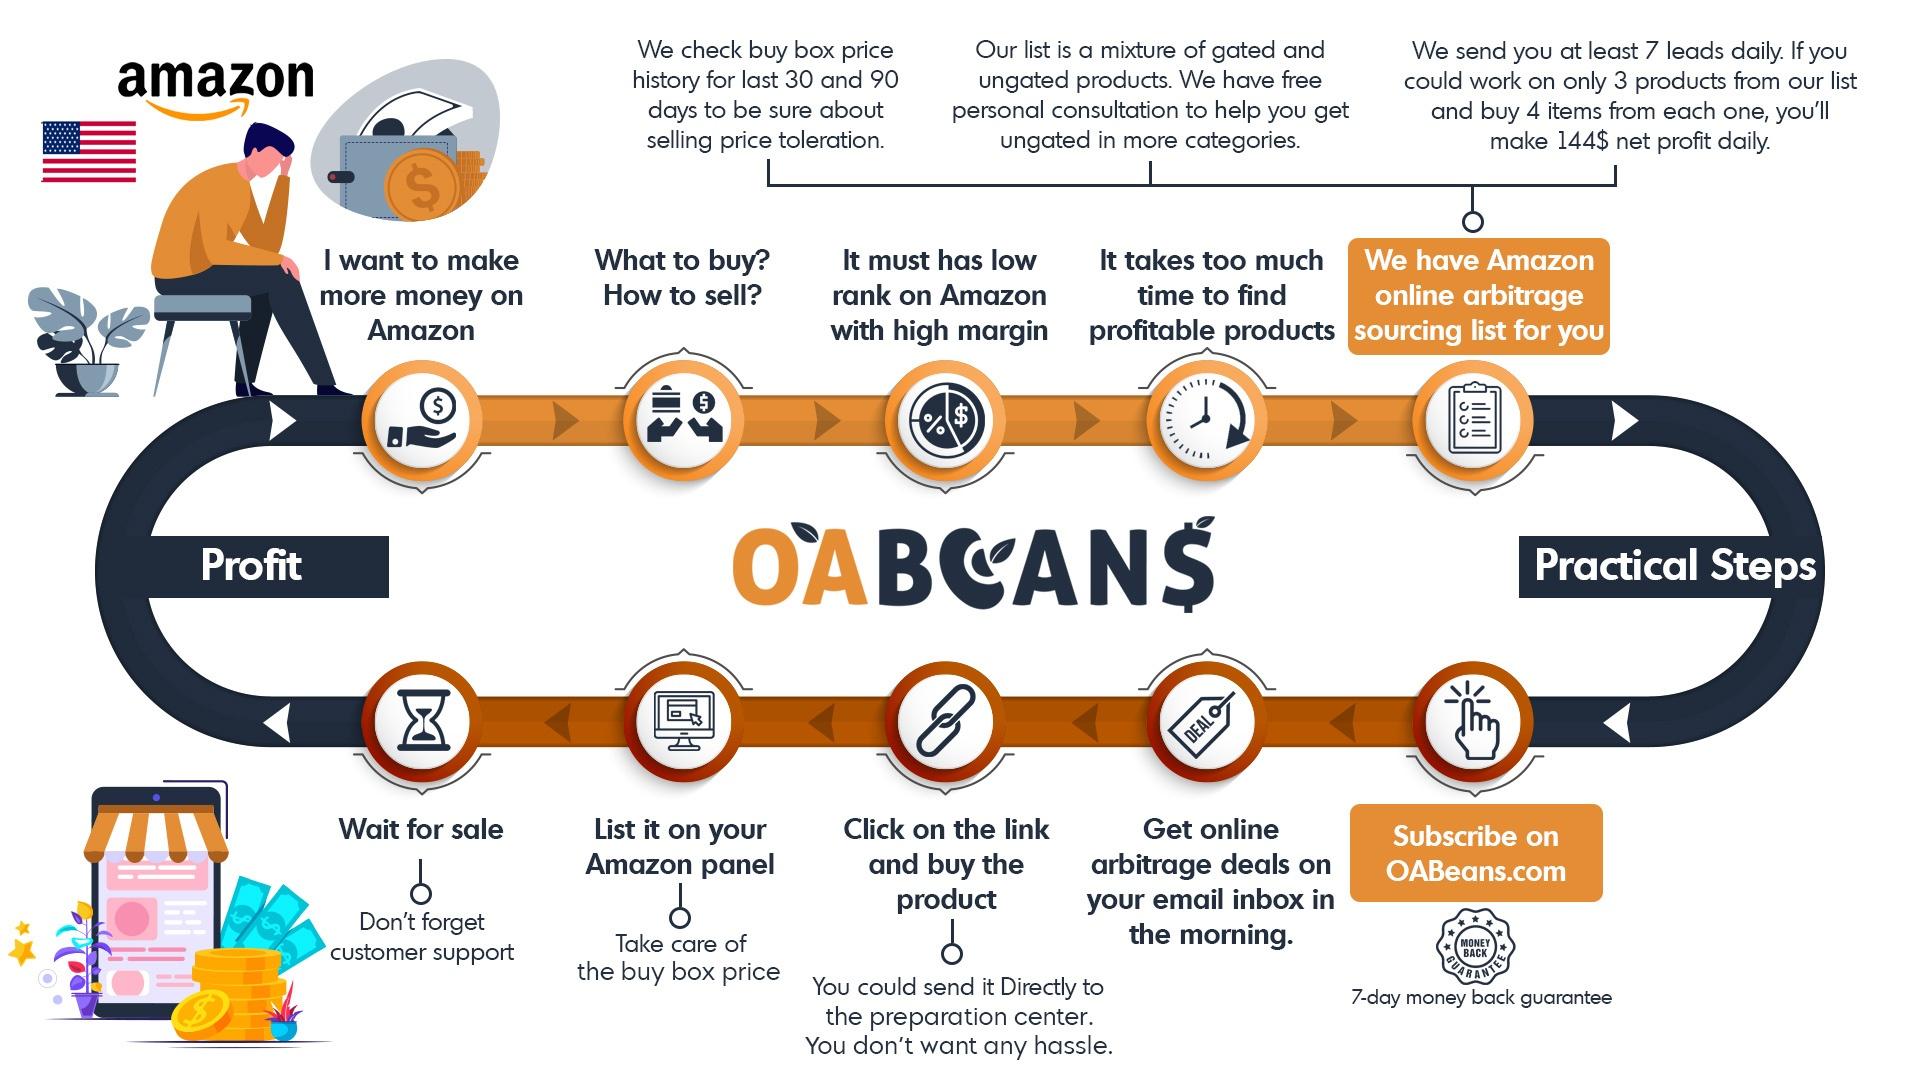 amazon online arbitrage sourcing guideline